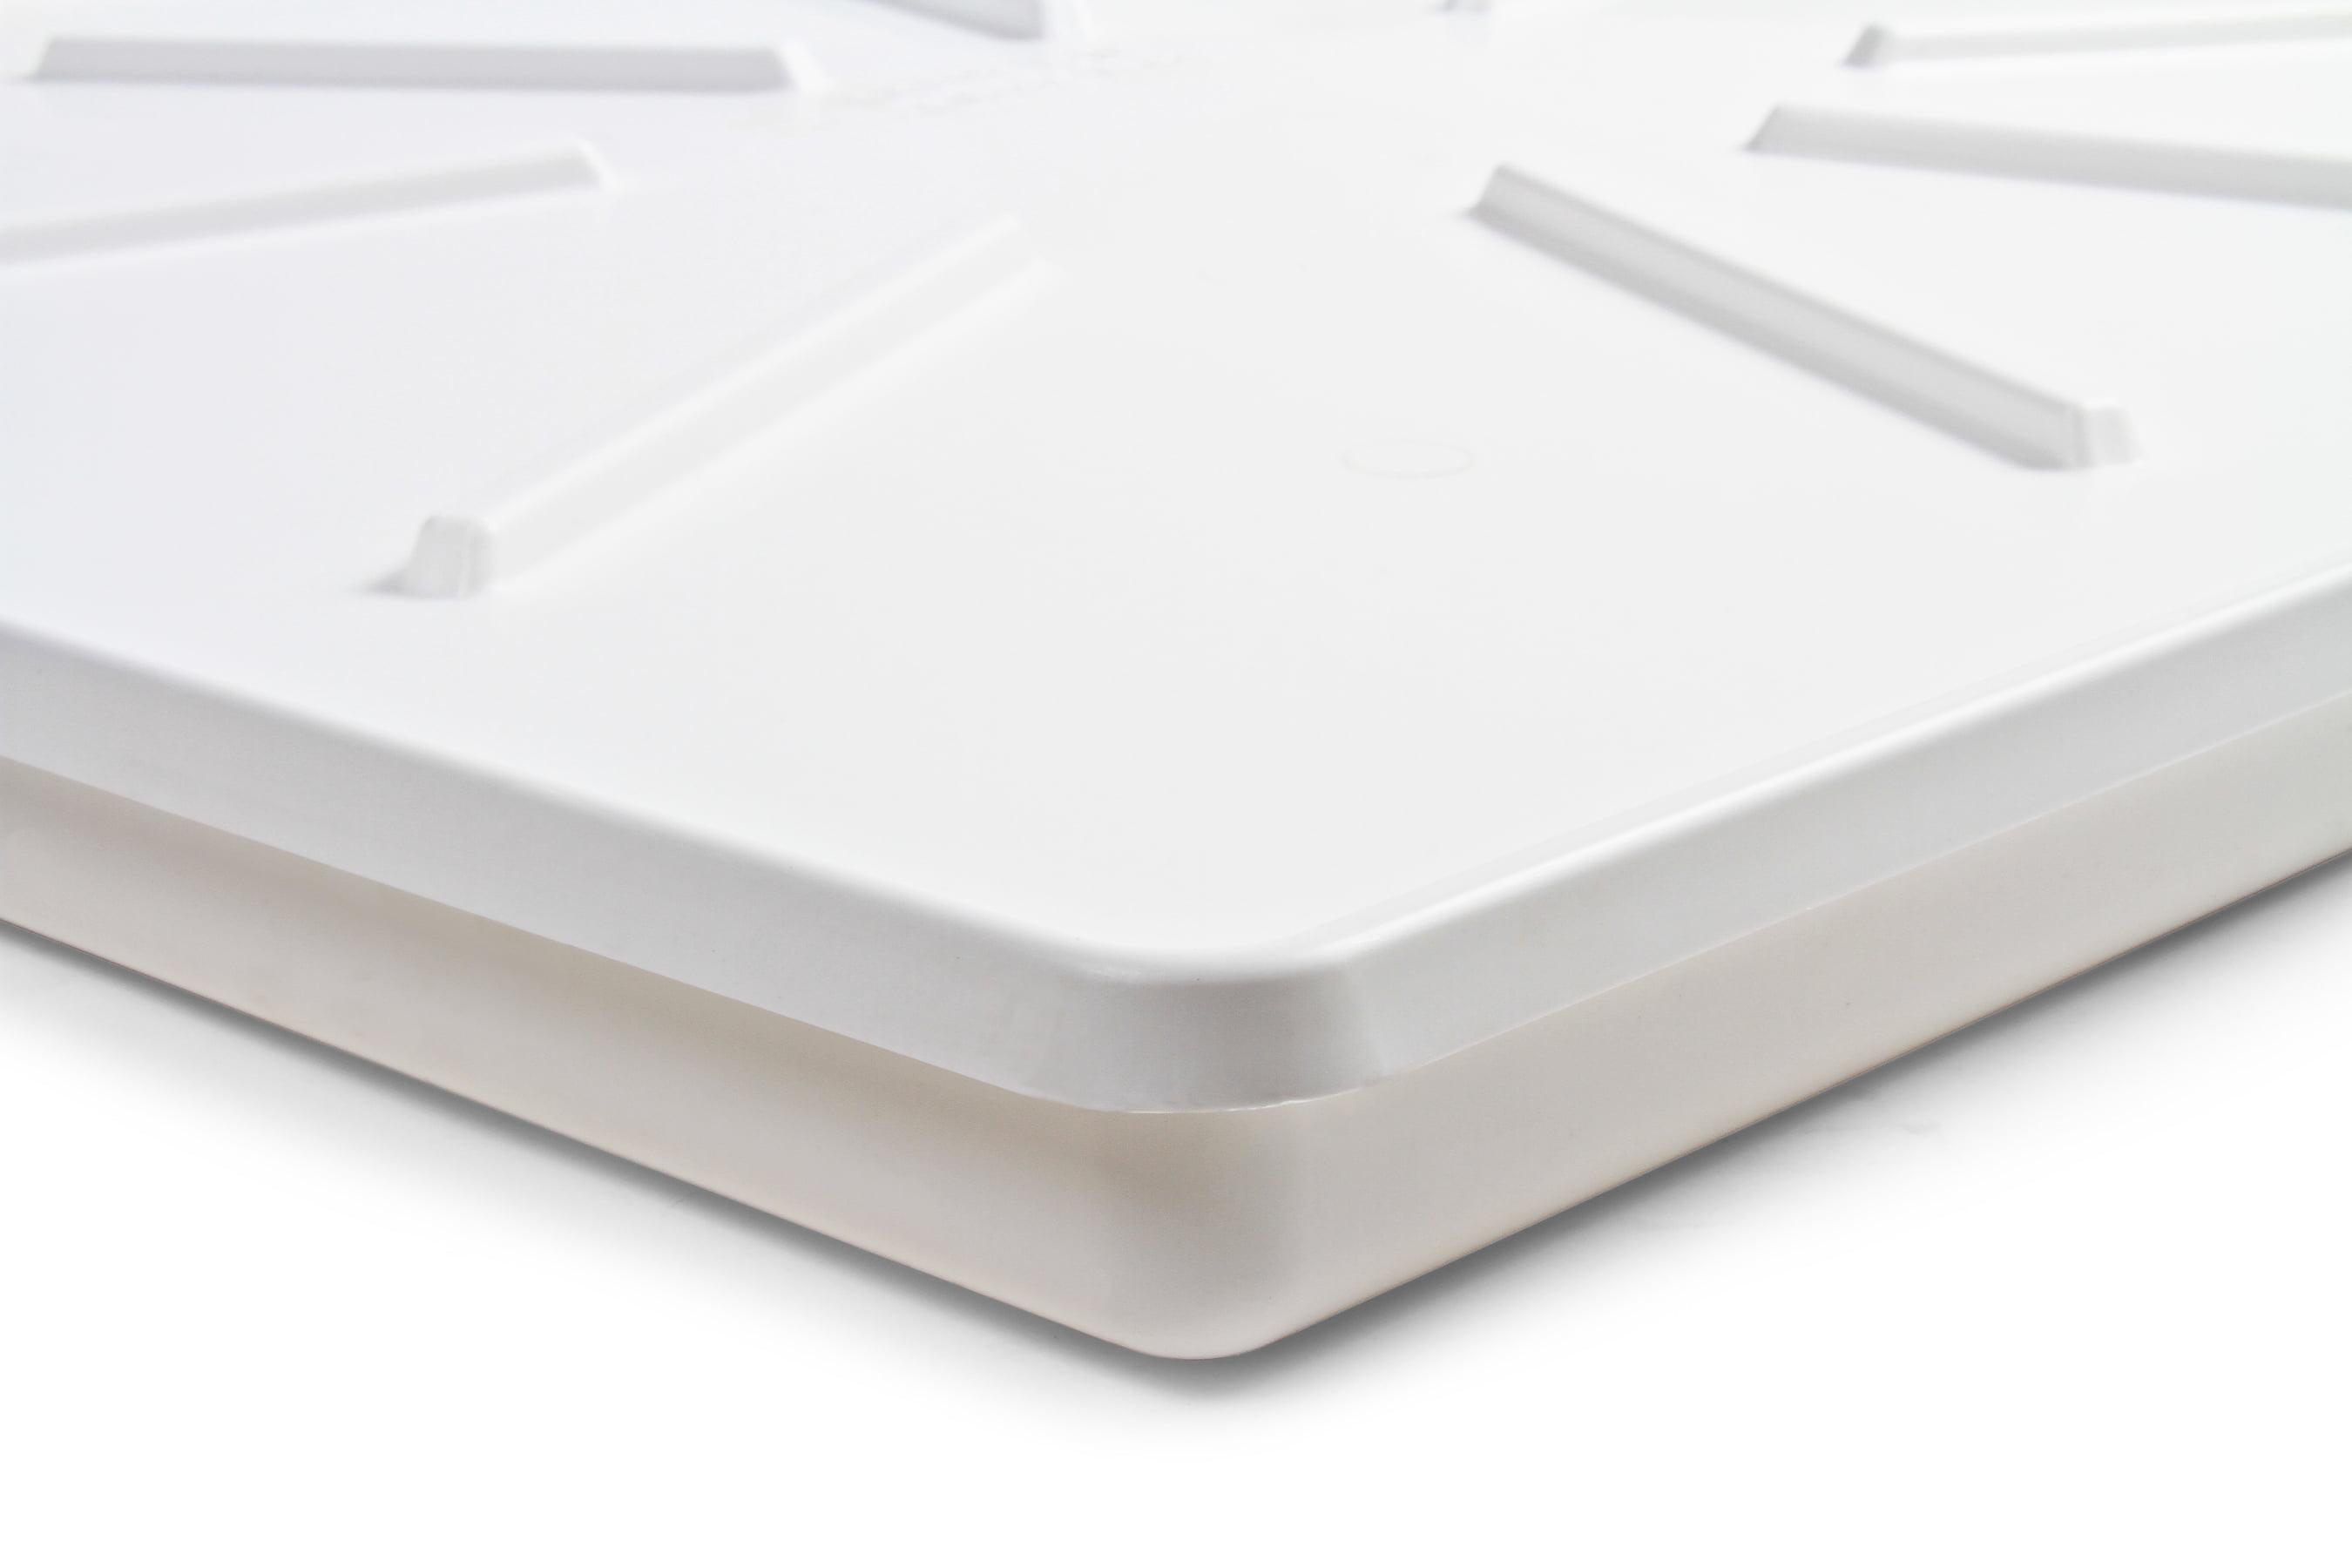 Camco 20786 30 5 X 34 5 Washing Machine Drain Pan For Front Loading Machines W Pvc Fitting White Walmart Com Walmart Com